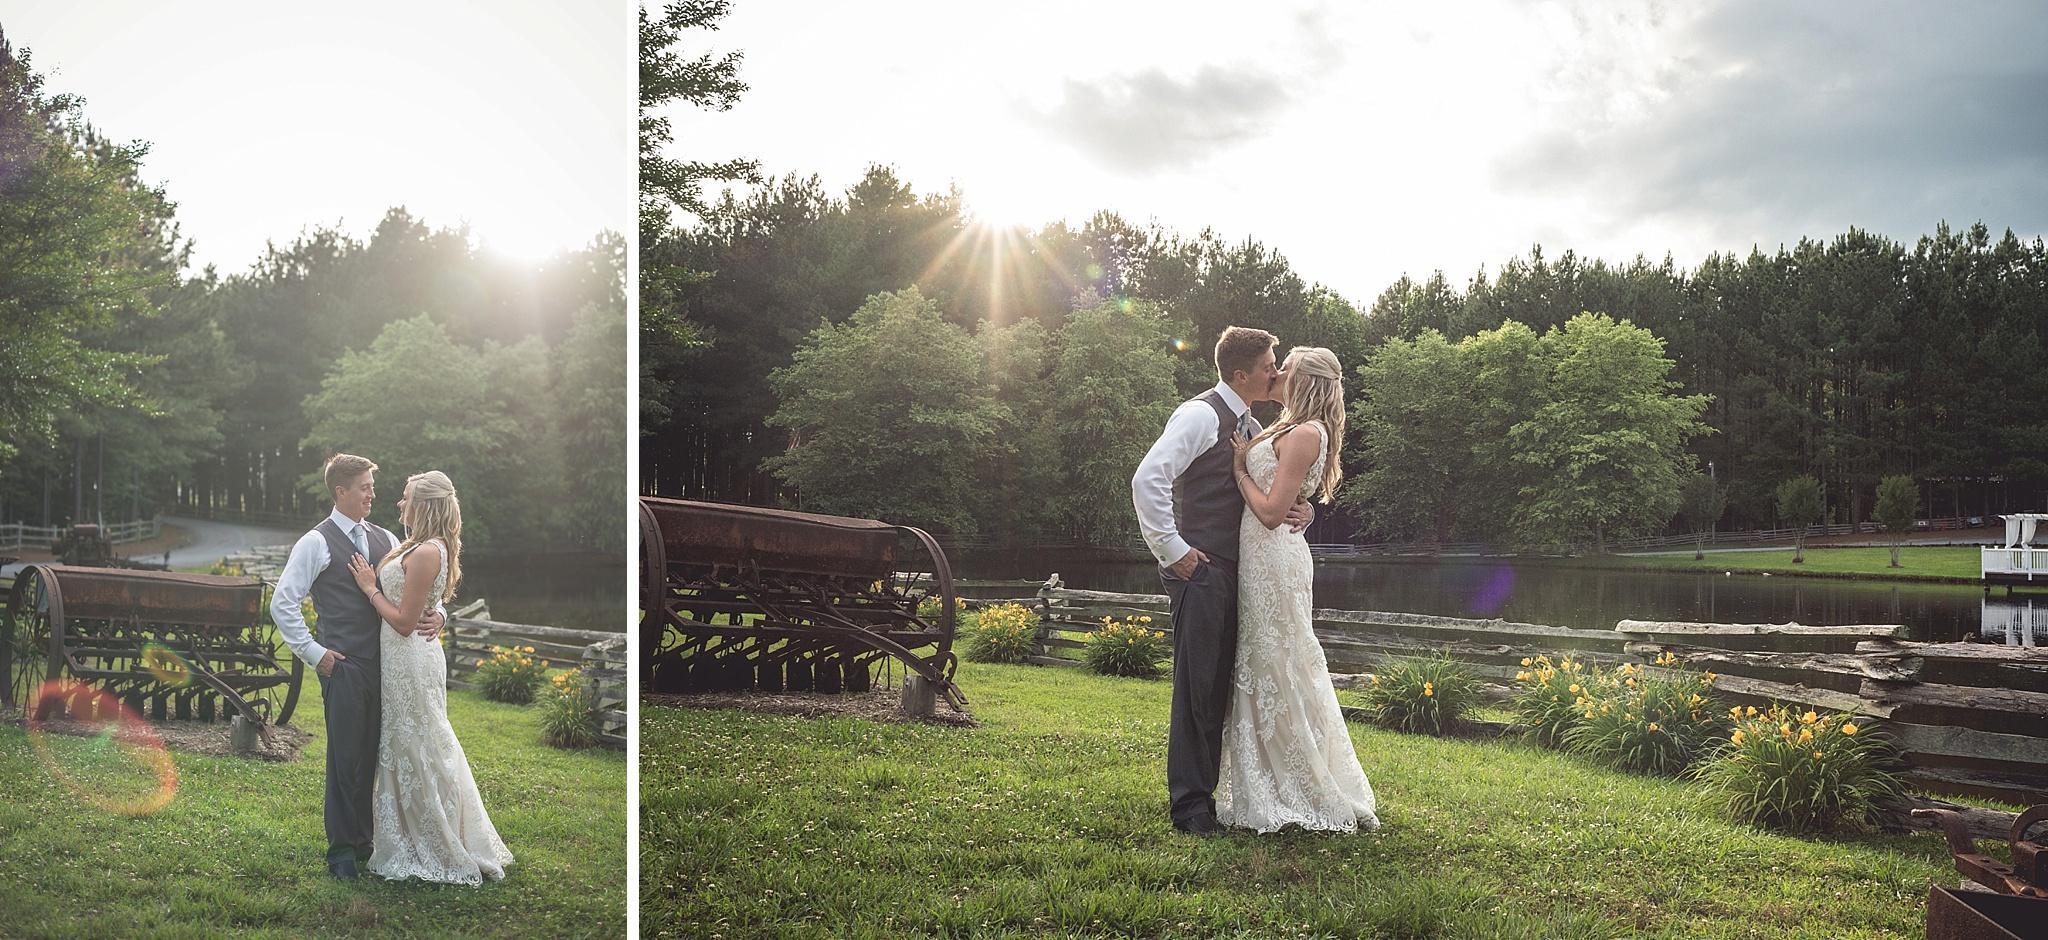 Shady-Wagon-Farm-NC-Wedding-Photographer-0183.jpg